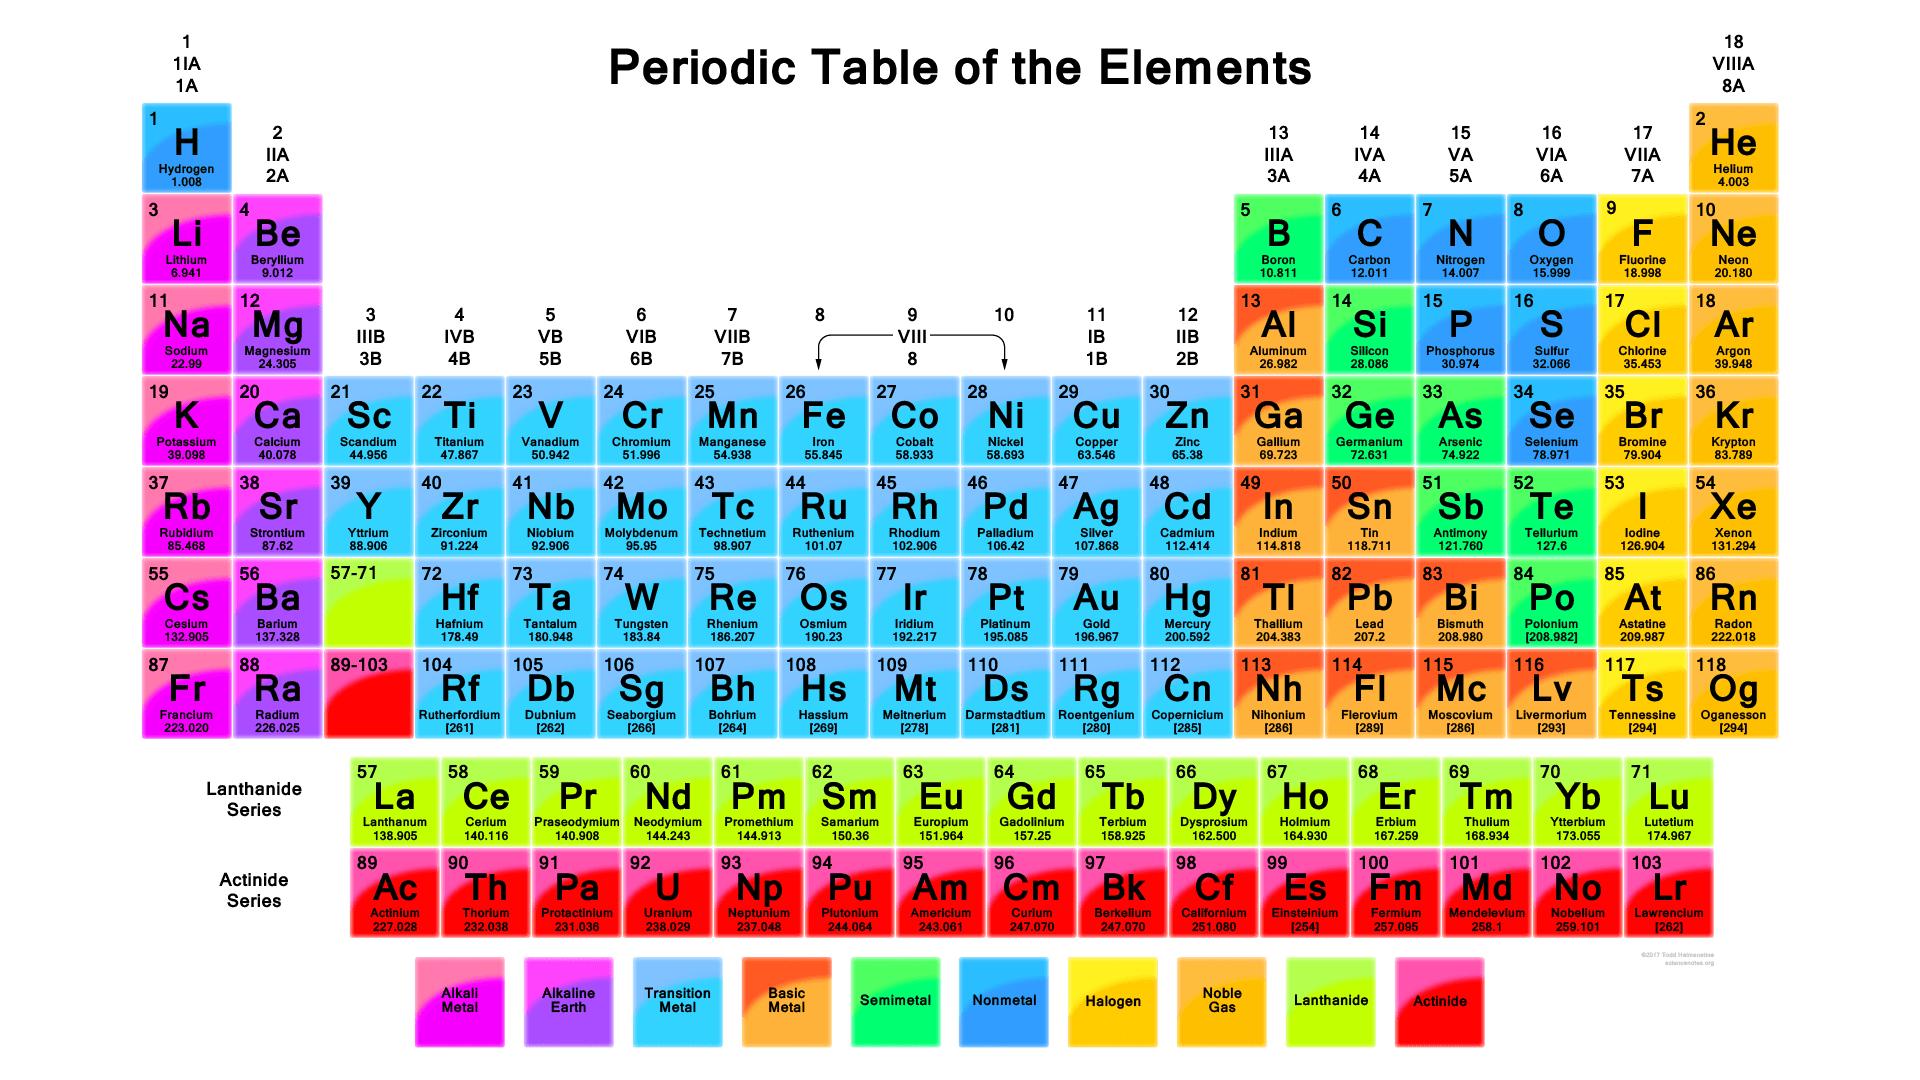 Kimia organik adalah salah satu bidang ilmu kimia yang mempelajari senyawa organik. 25 Gambar Tabel Periodik Modern HD - Materi Kimia